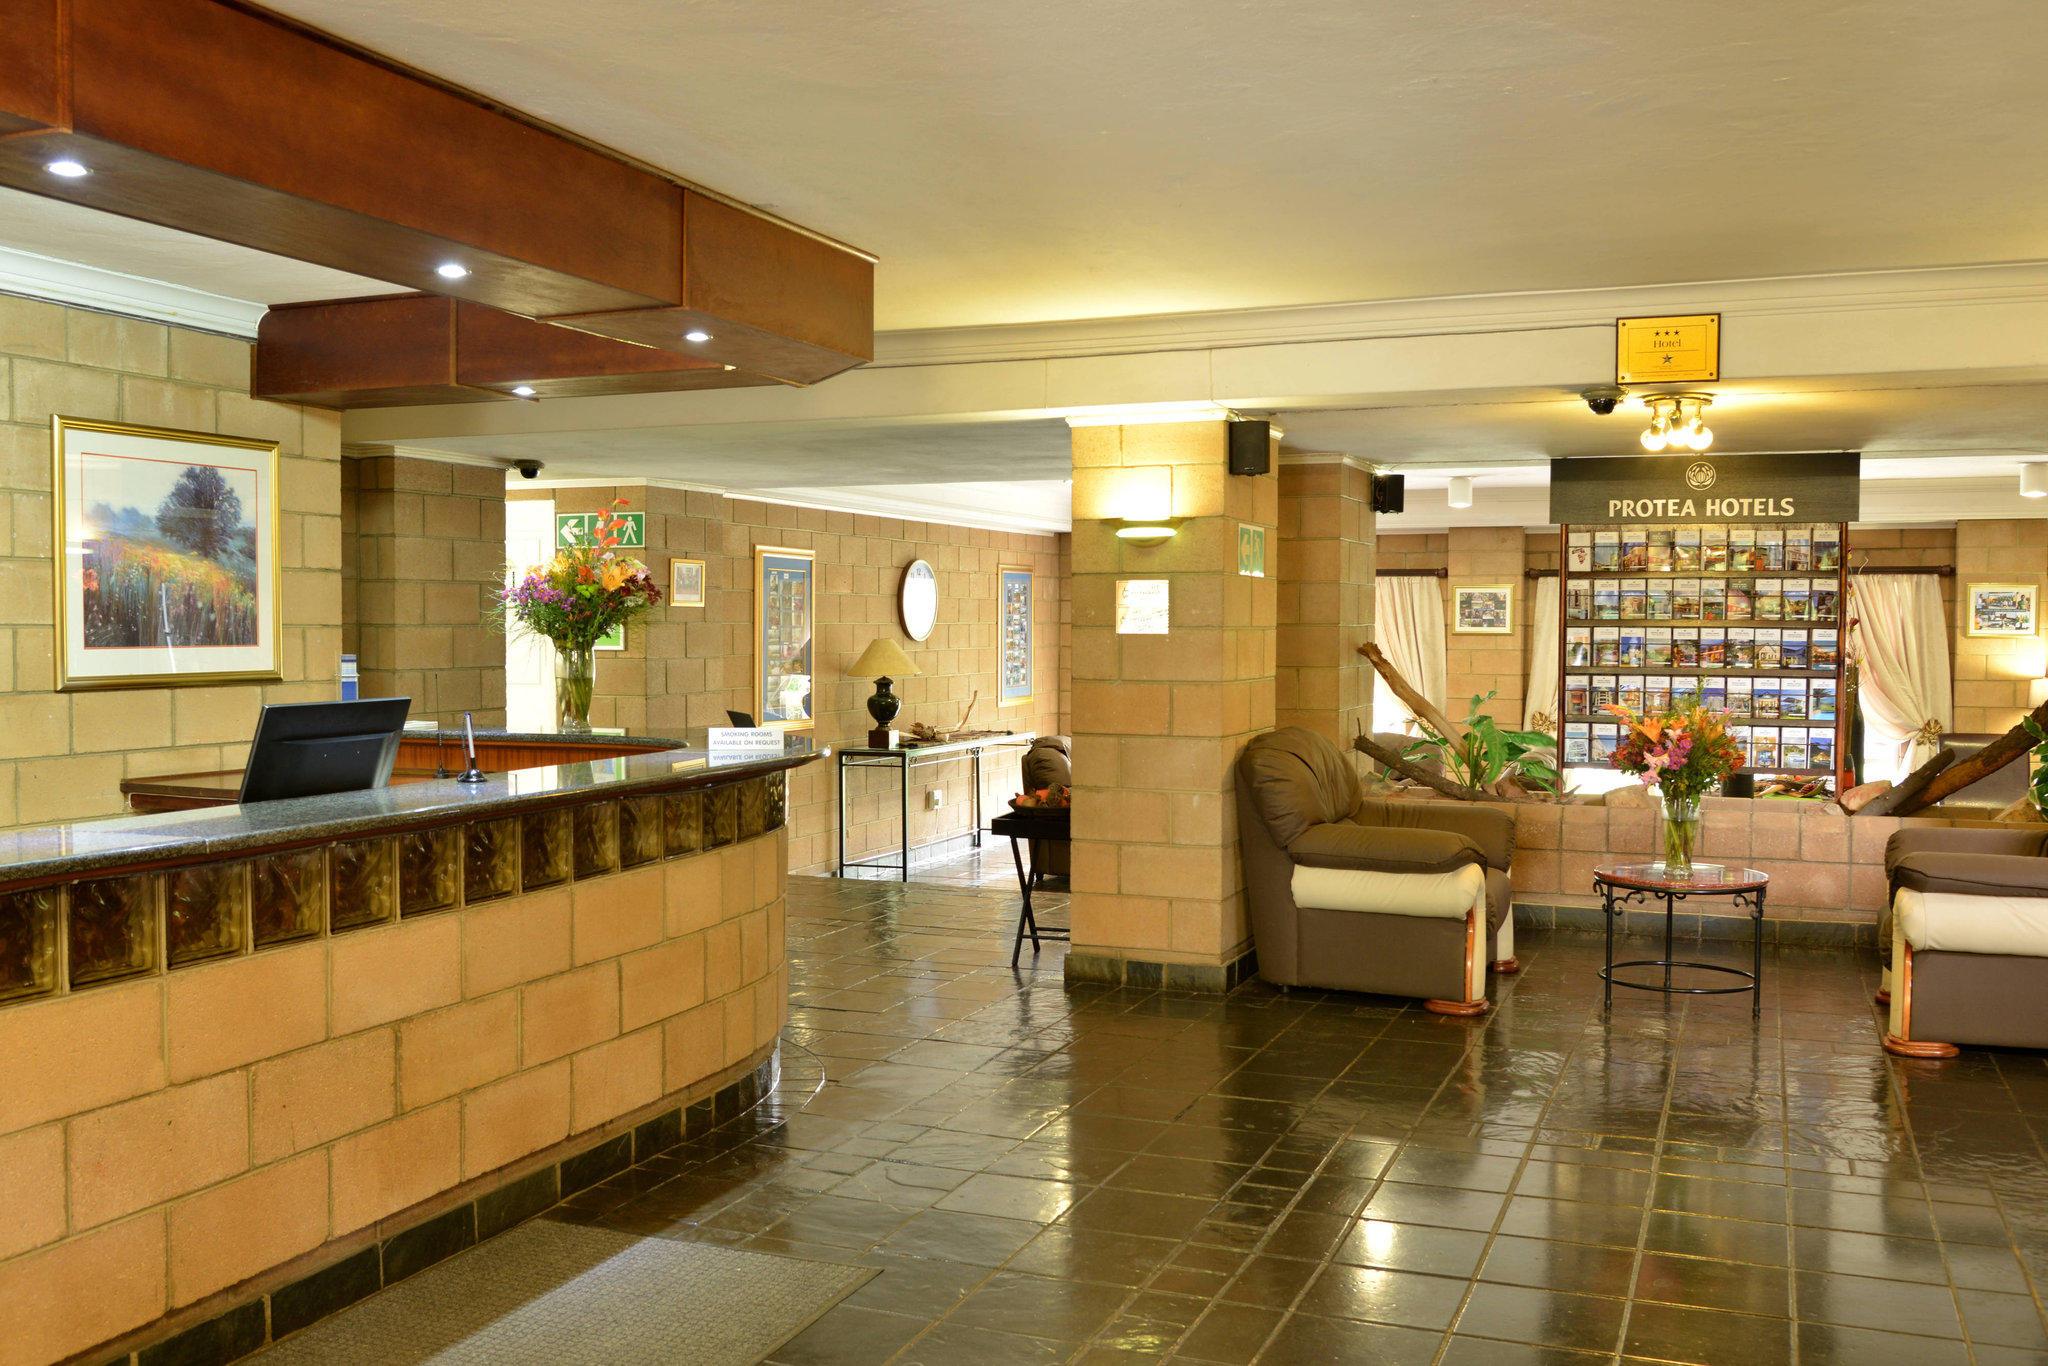 Protea Hotel by Marriott Klerksdorp